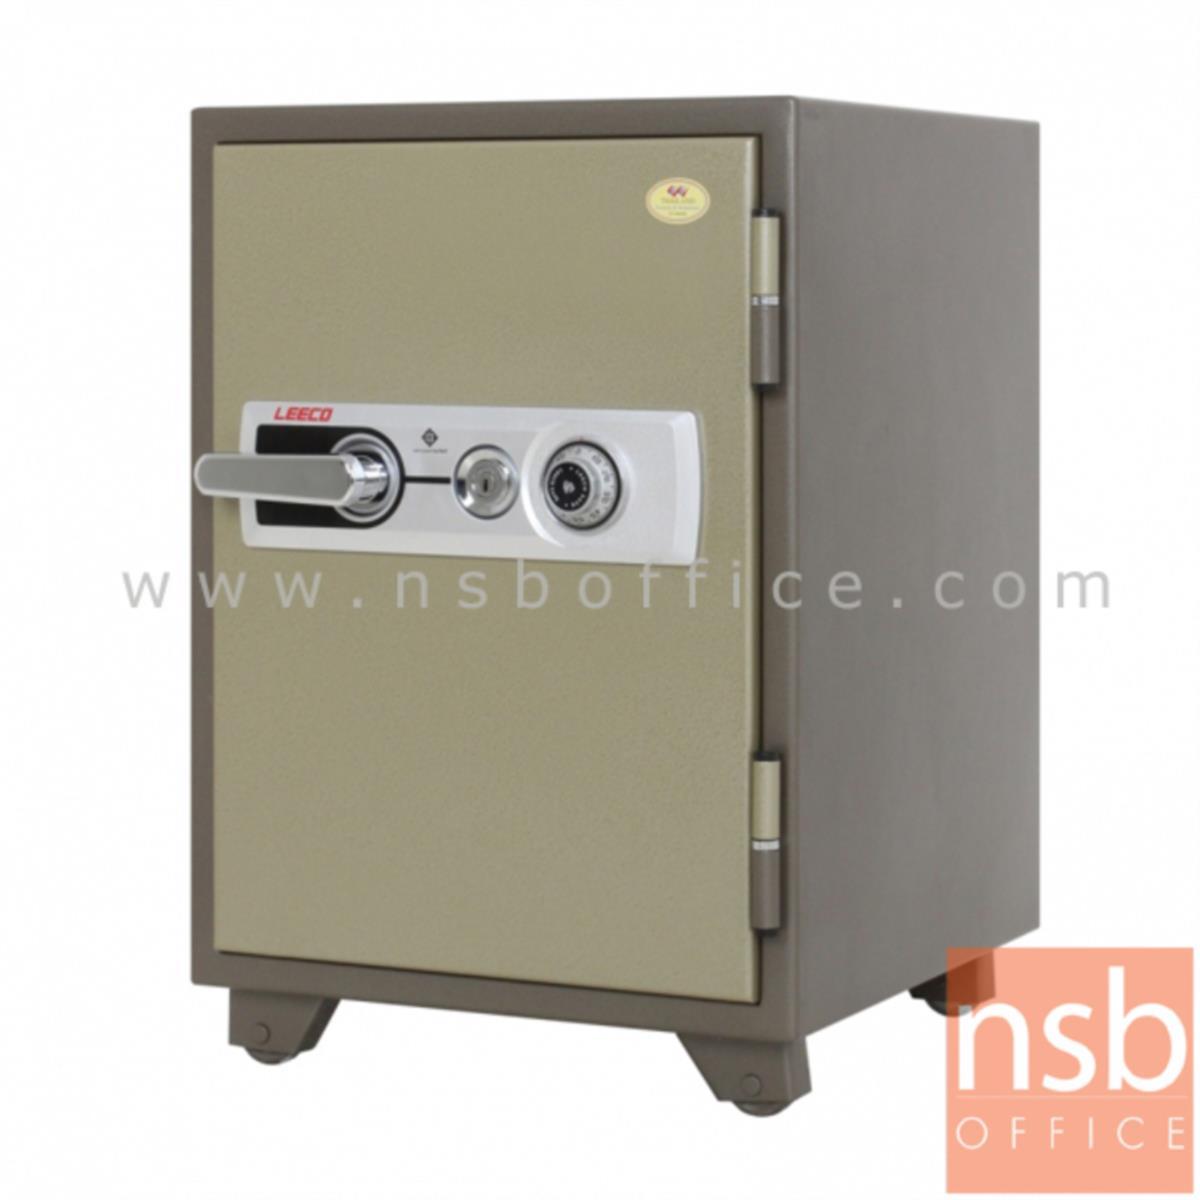 F02A002:ตู้เซฟนิรภัย 105 กก. ลีโก้ รุ่น NSD มี 1 กุญแจ 1 รหัส (เปลี่ยนรหัสไม่ได้)